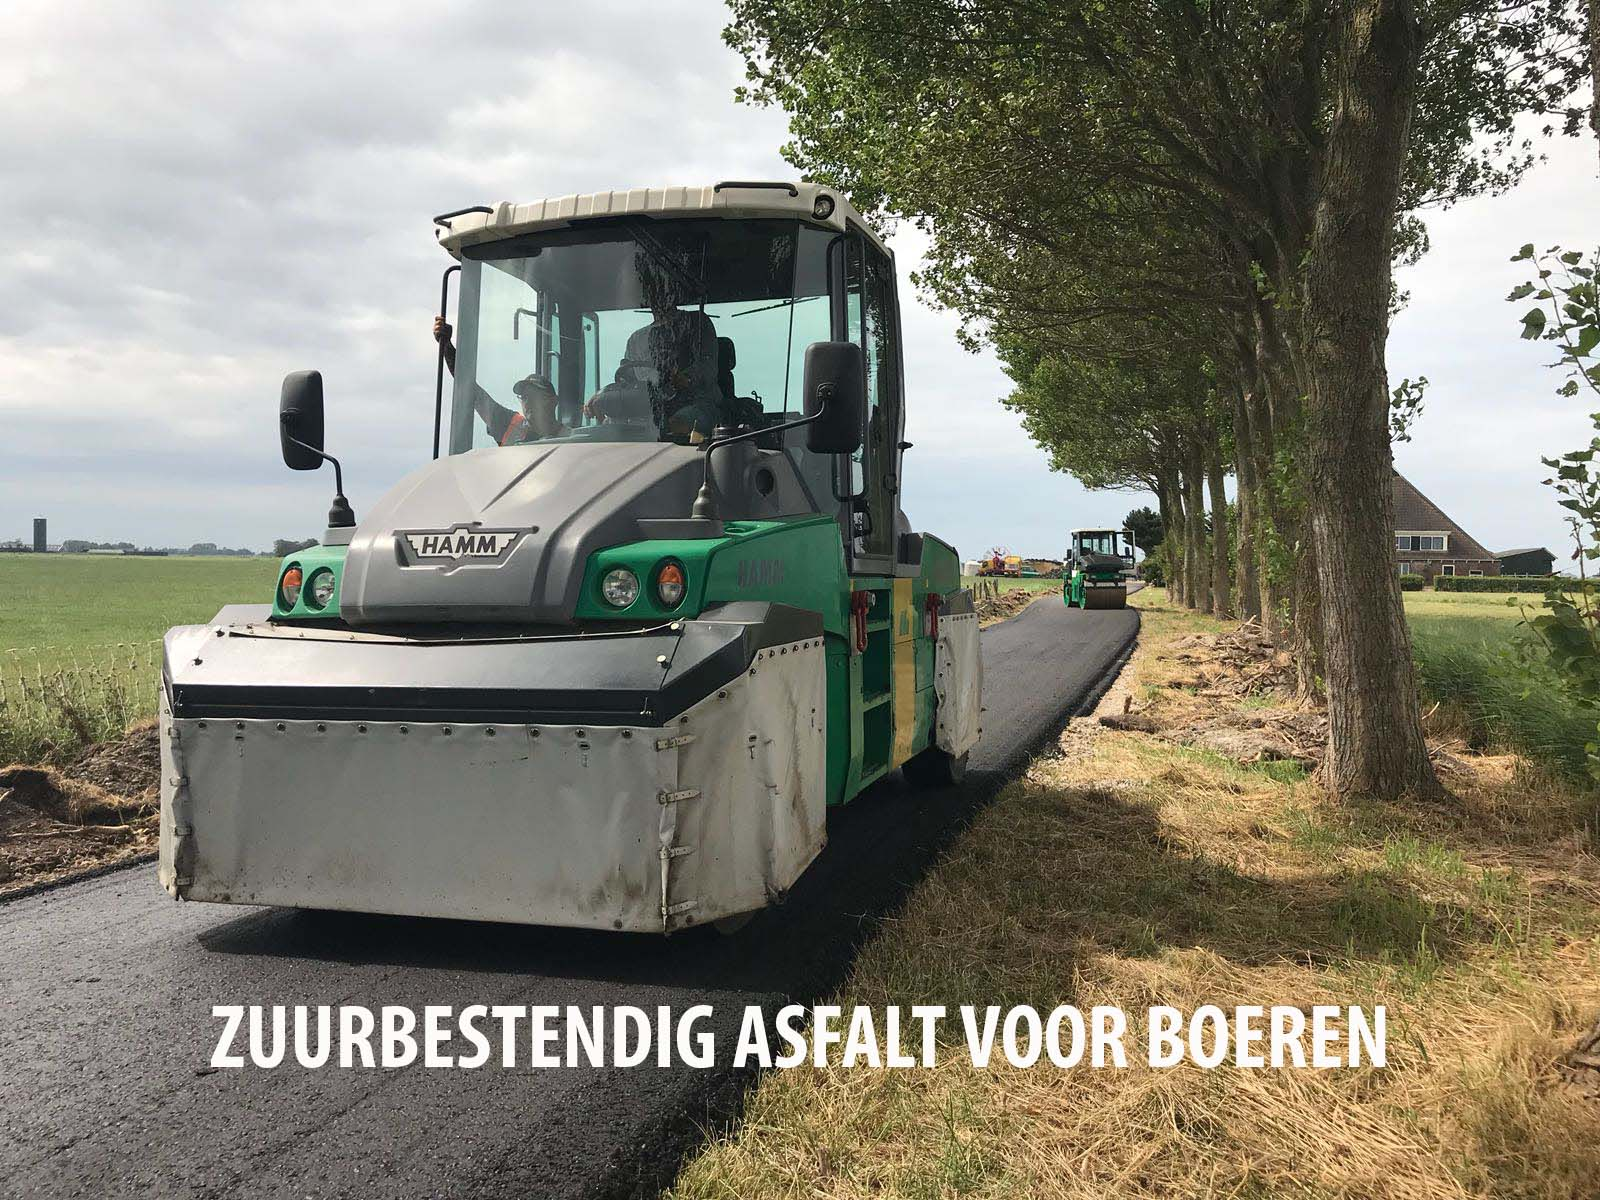 Zuurbestendig asfalt